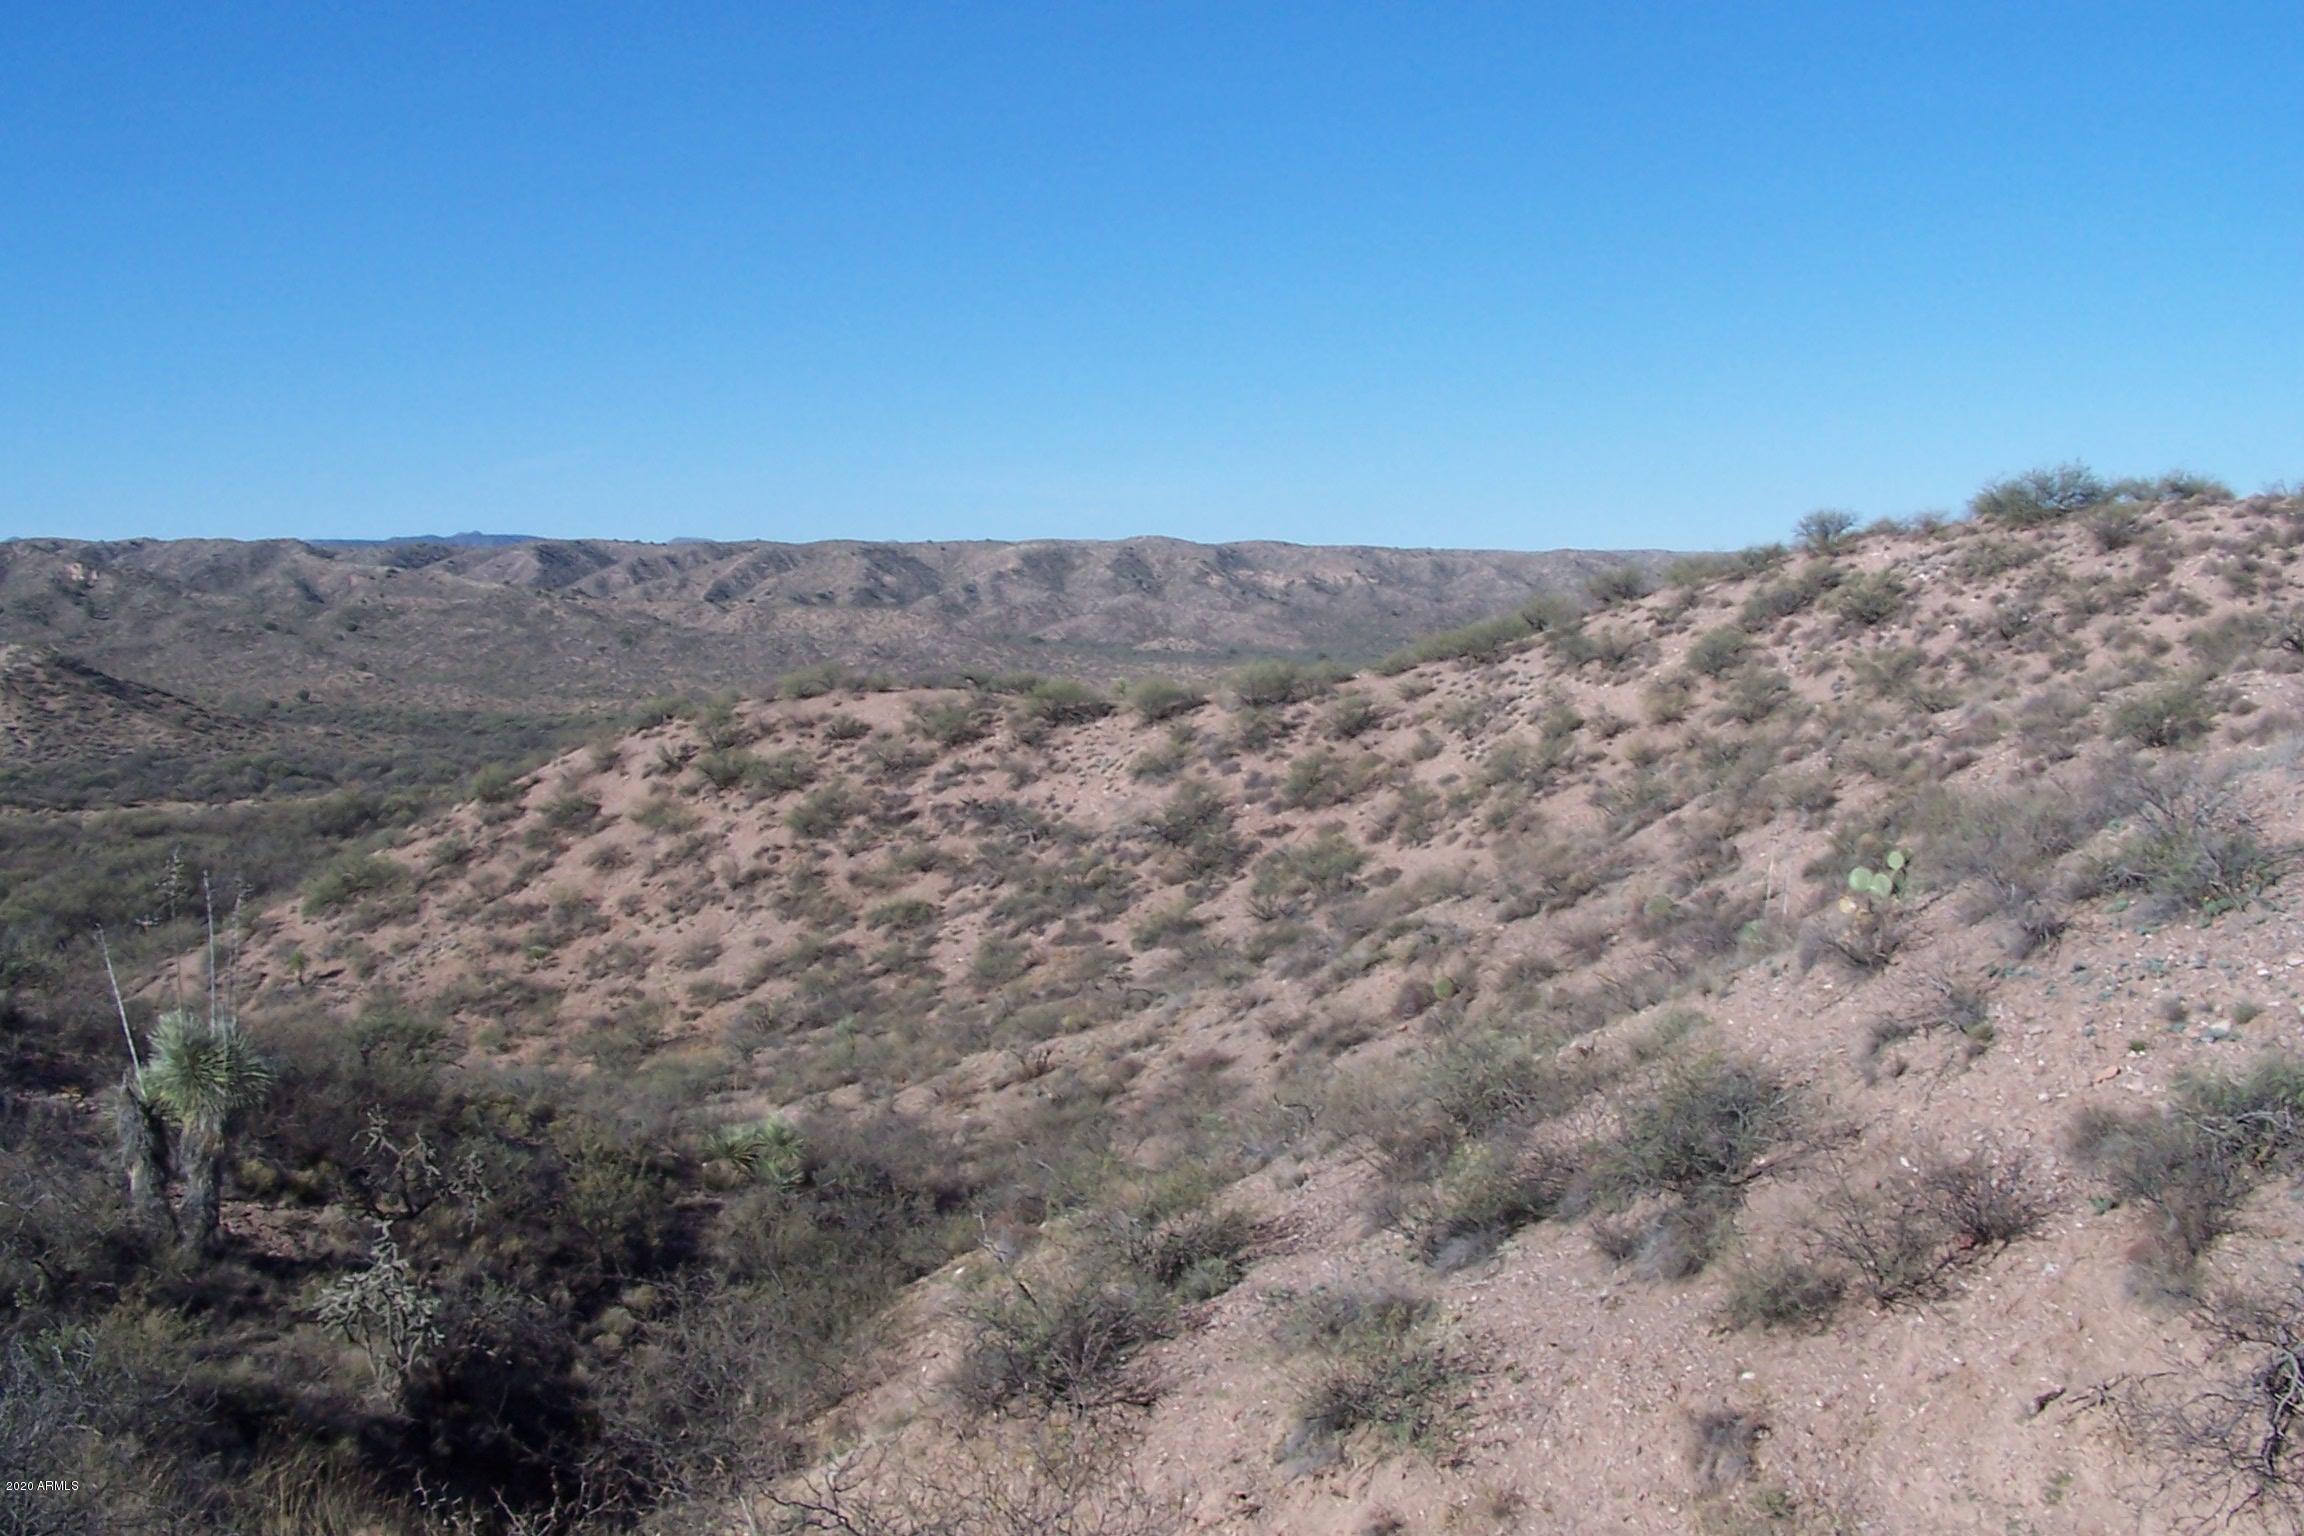 Lot 204 42ac Pronghorn Ridge Road # 204, Willcox, Arizona 85643, ,Land,For Sale,Lot 204 42ac Pronghorn Ridge Road # 204,6154951